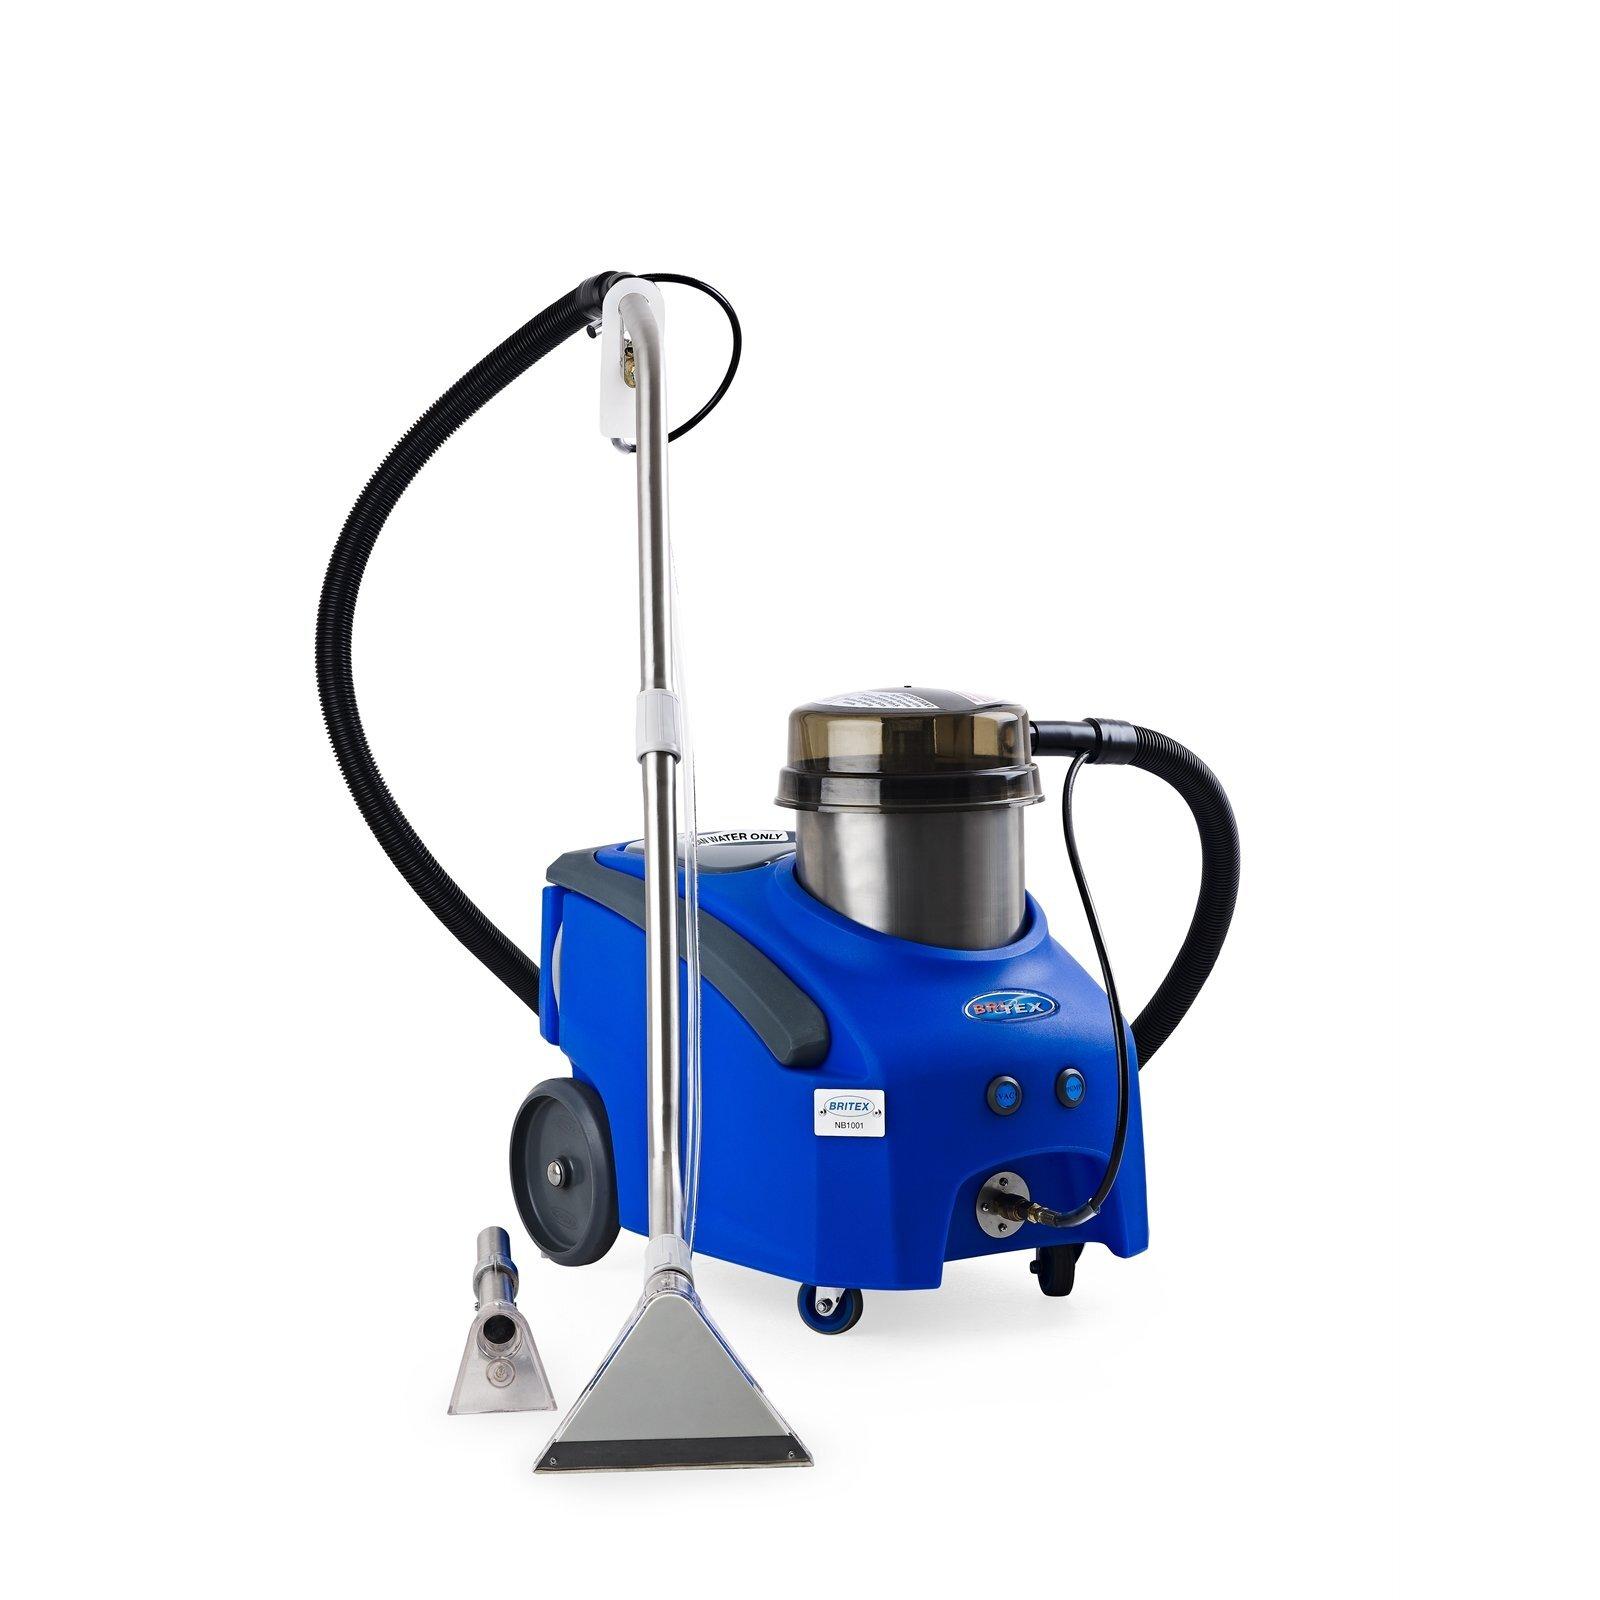 For Hire: Britex Carpet Cleaner - 48hr